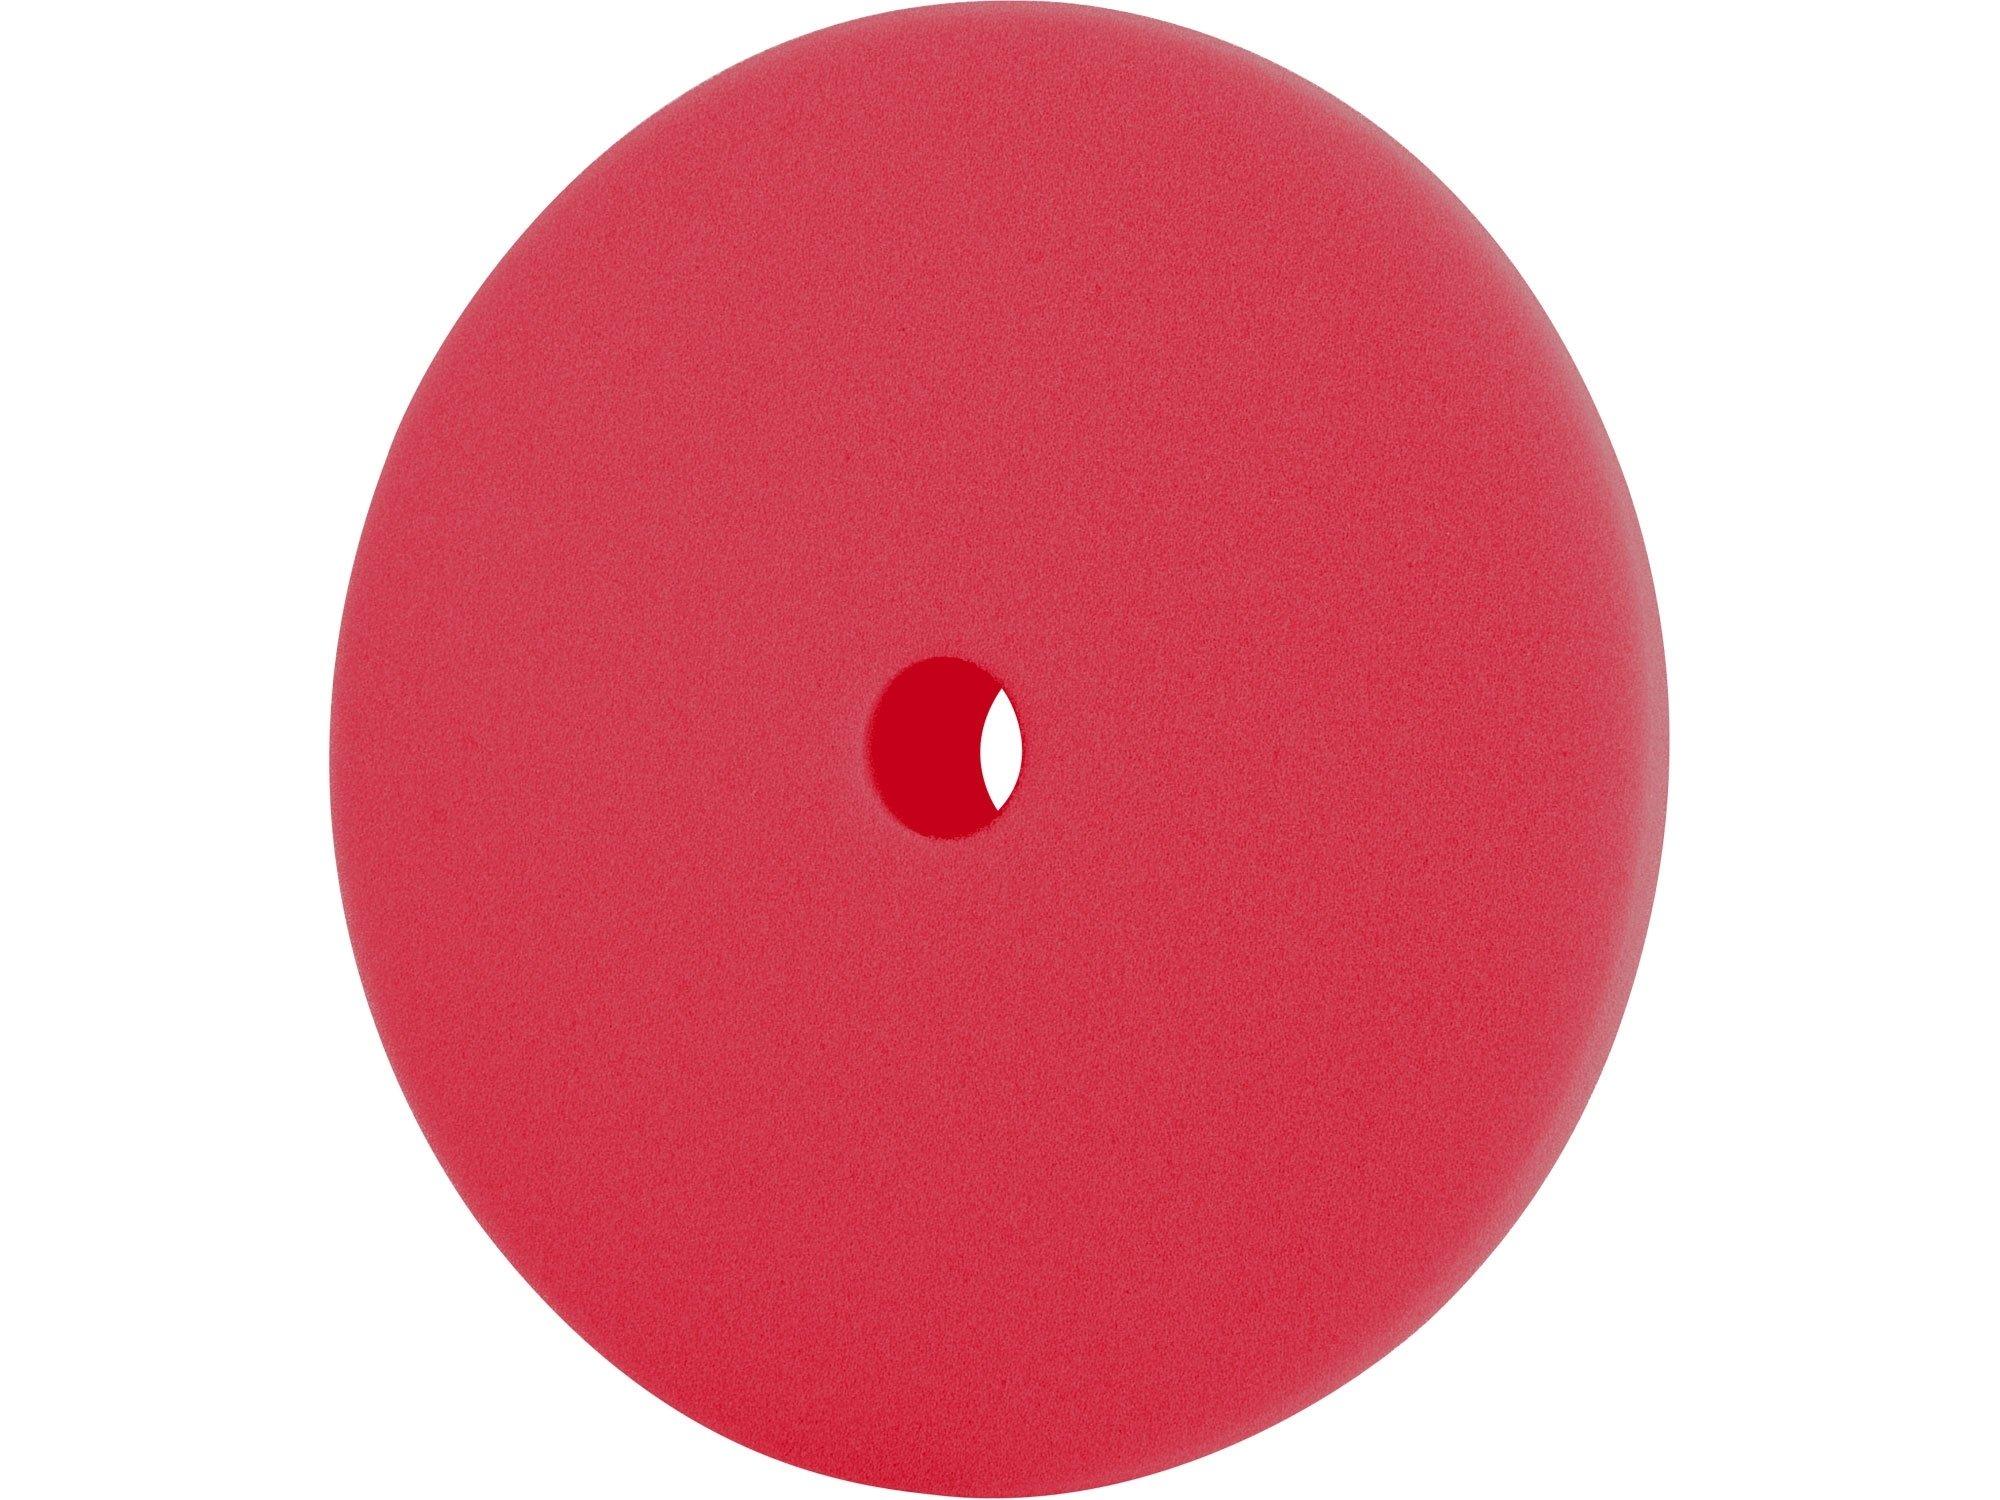 Kotouč lešticí pěnový na suchý zip T10 Extol Premium - 8804541 150mm